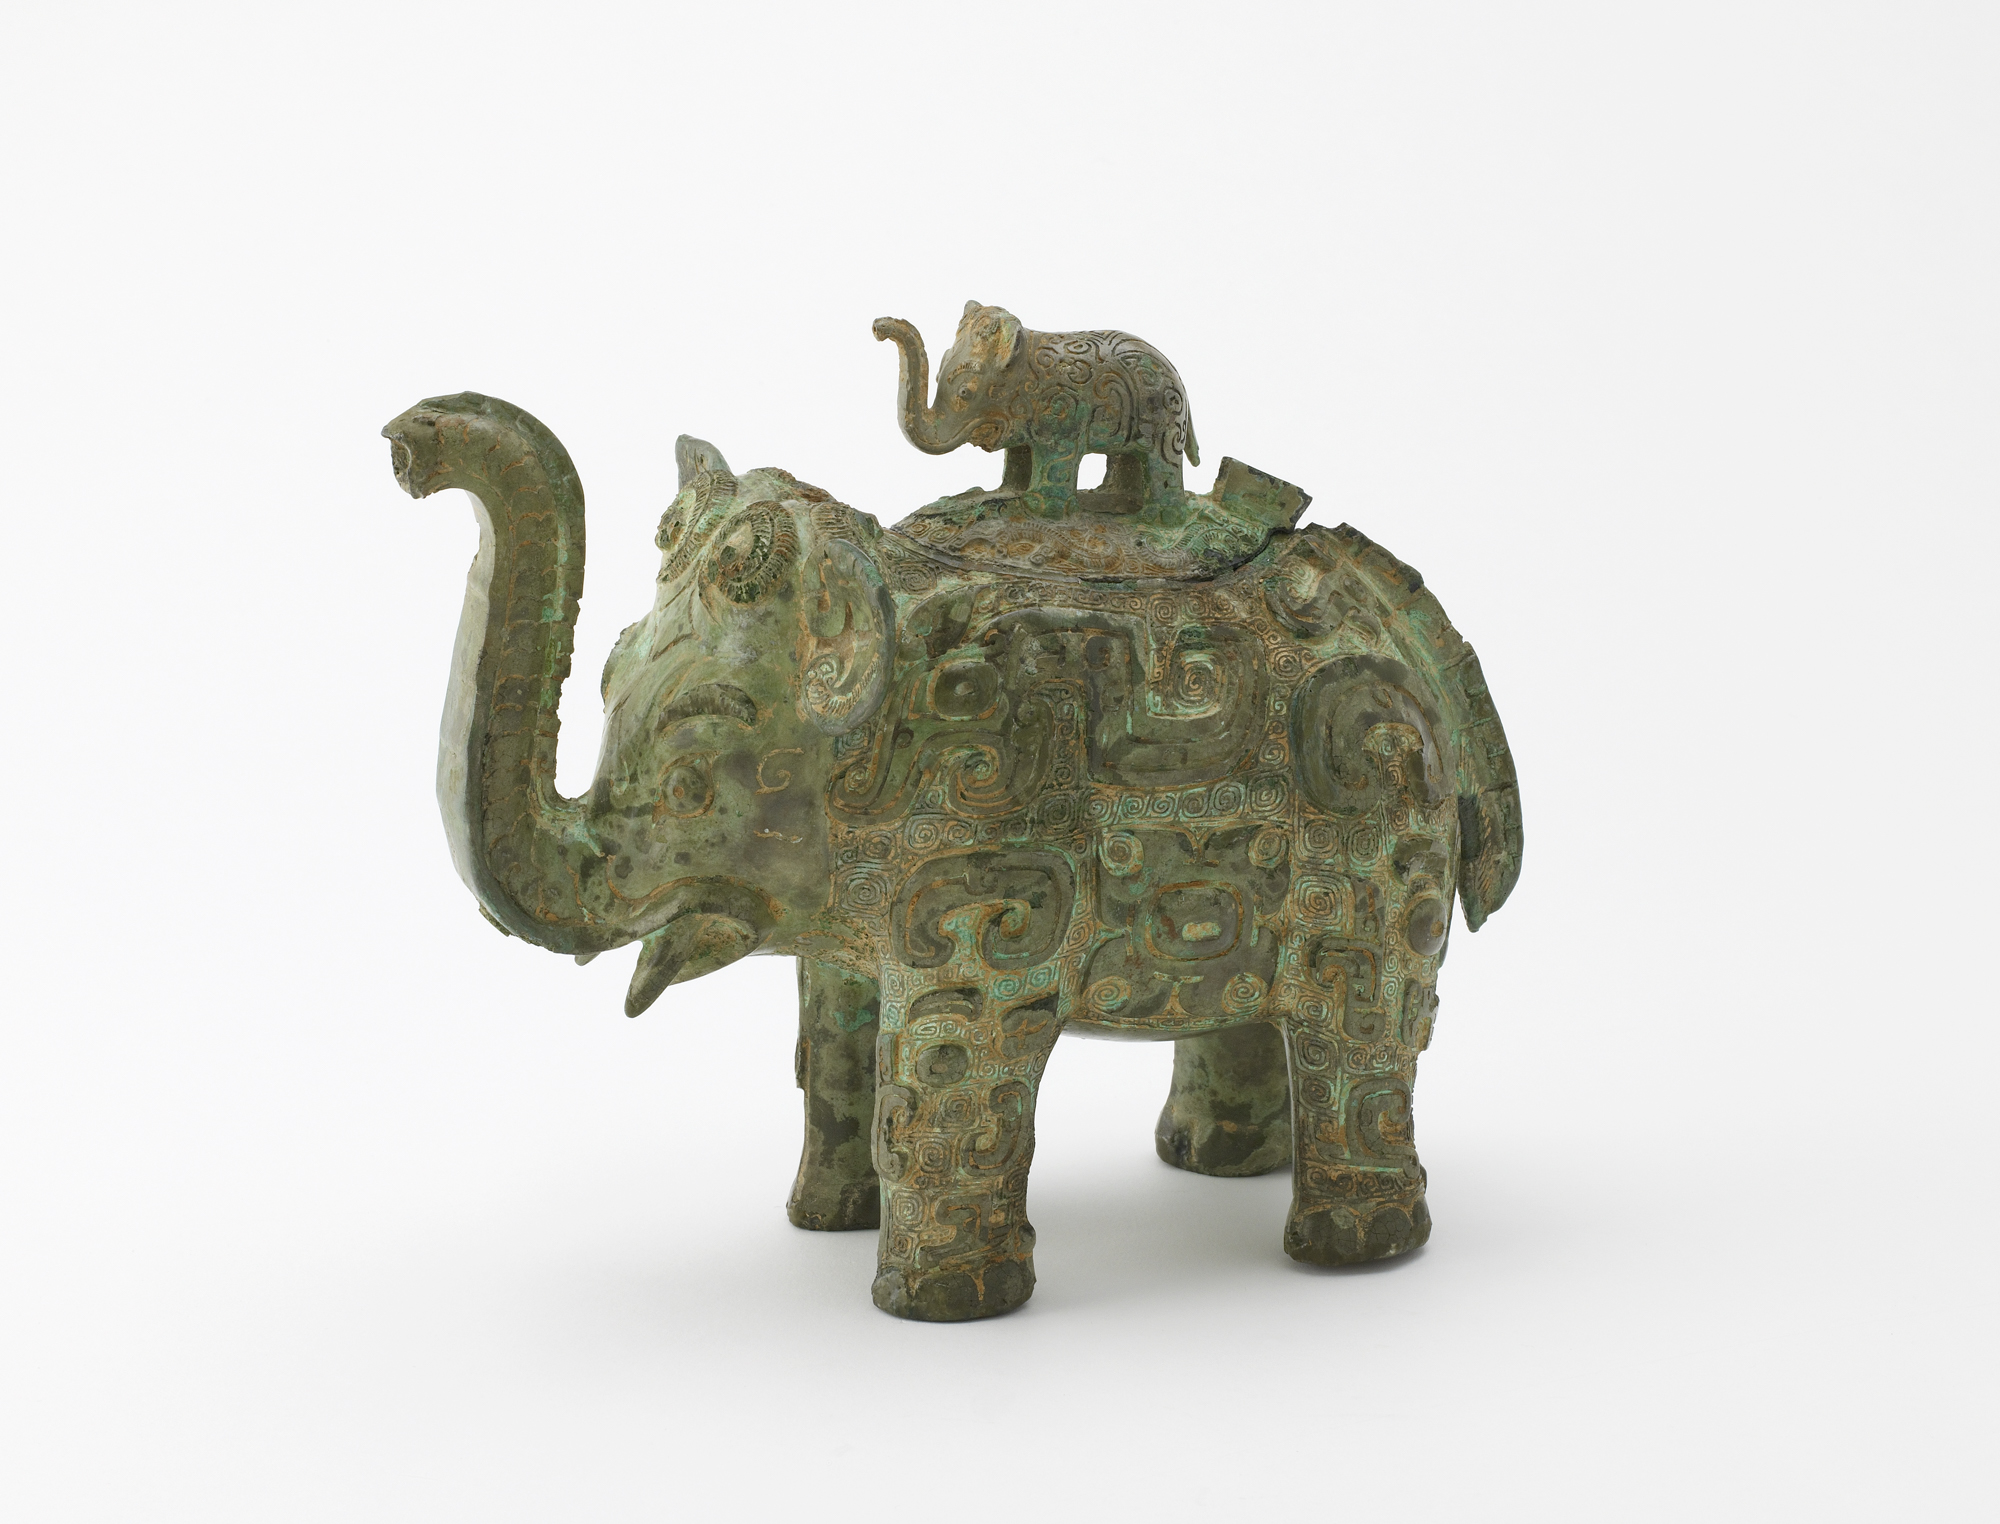 metalwork wine vessel in the shape of an elephant